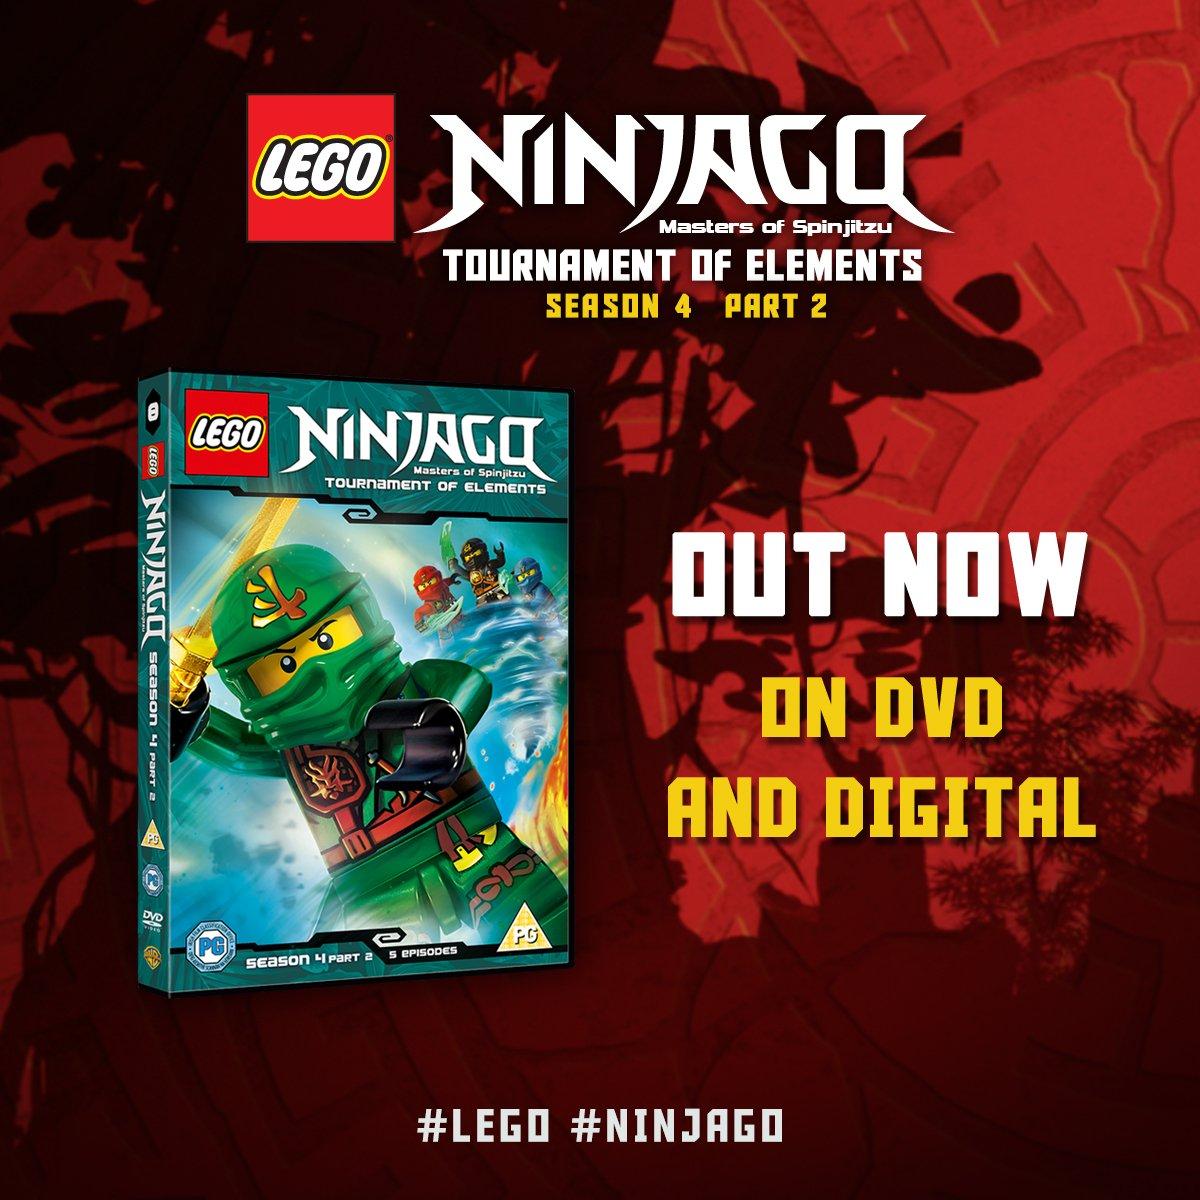 Ninjago Season 2 Episode 1